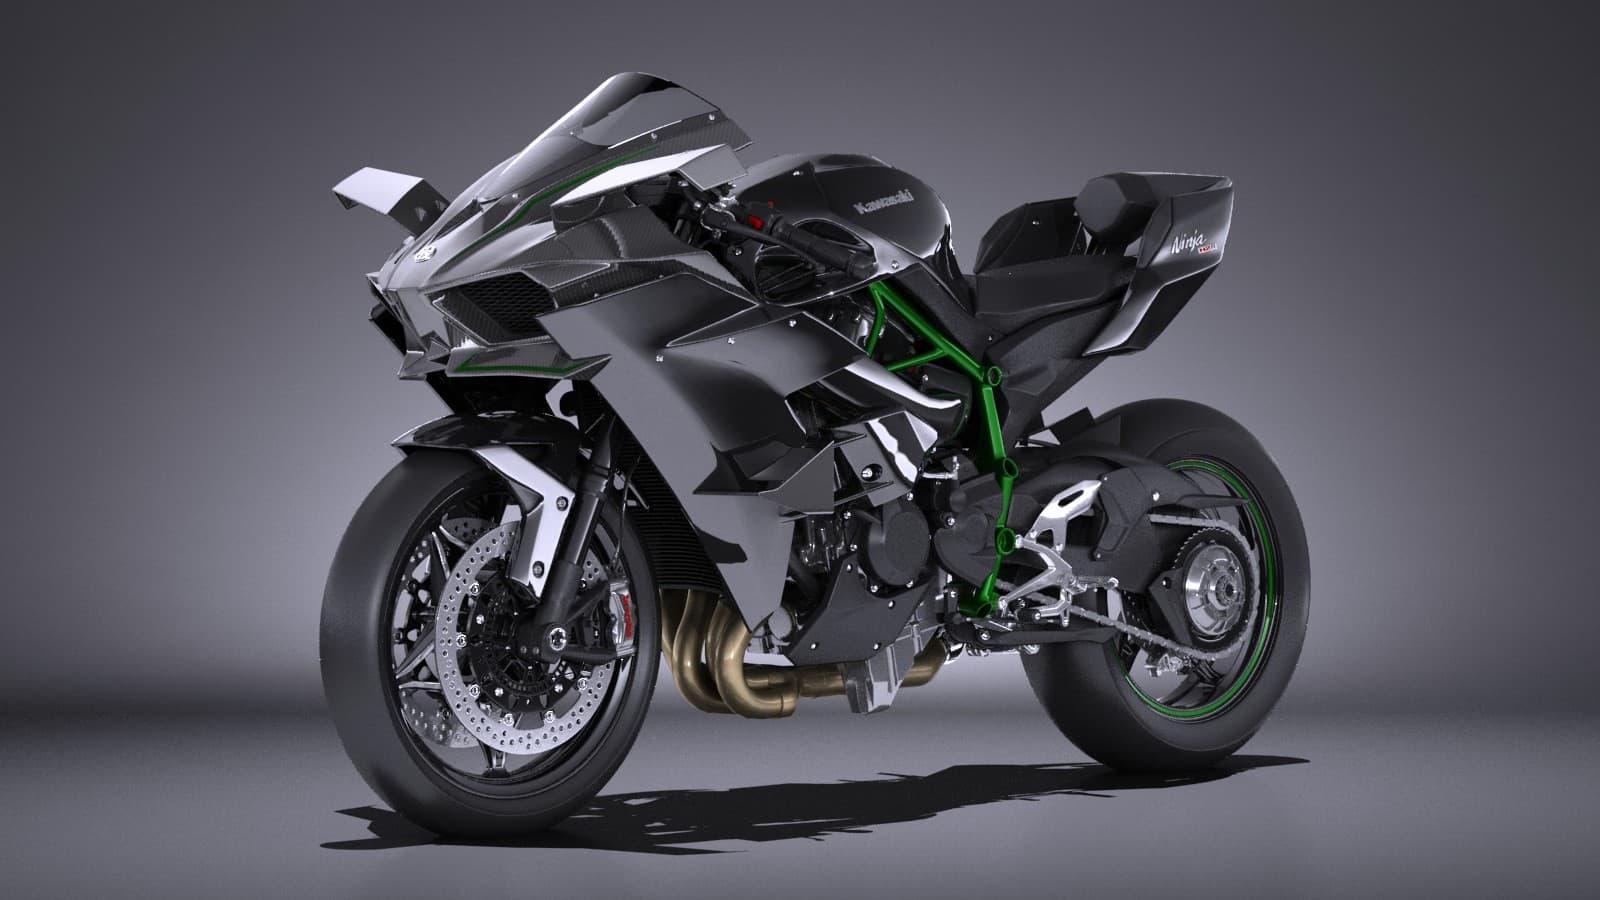 Kawasaki Ninja H2r >> Kawasaki Ninja H2r Supercharged 2016 3d Model